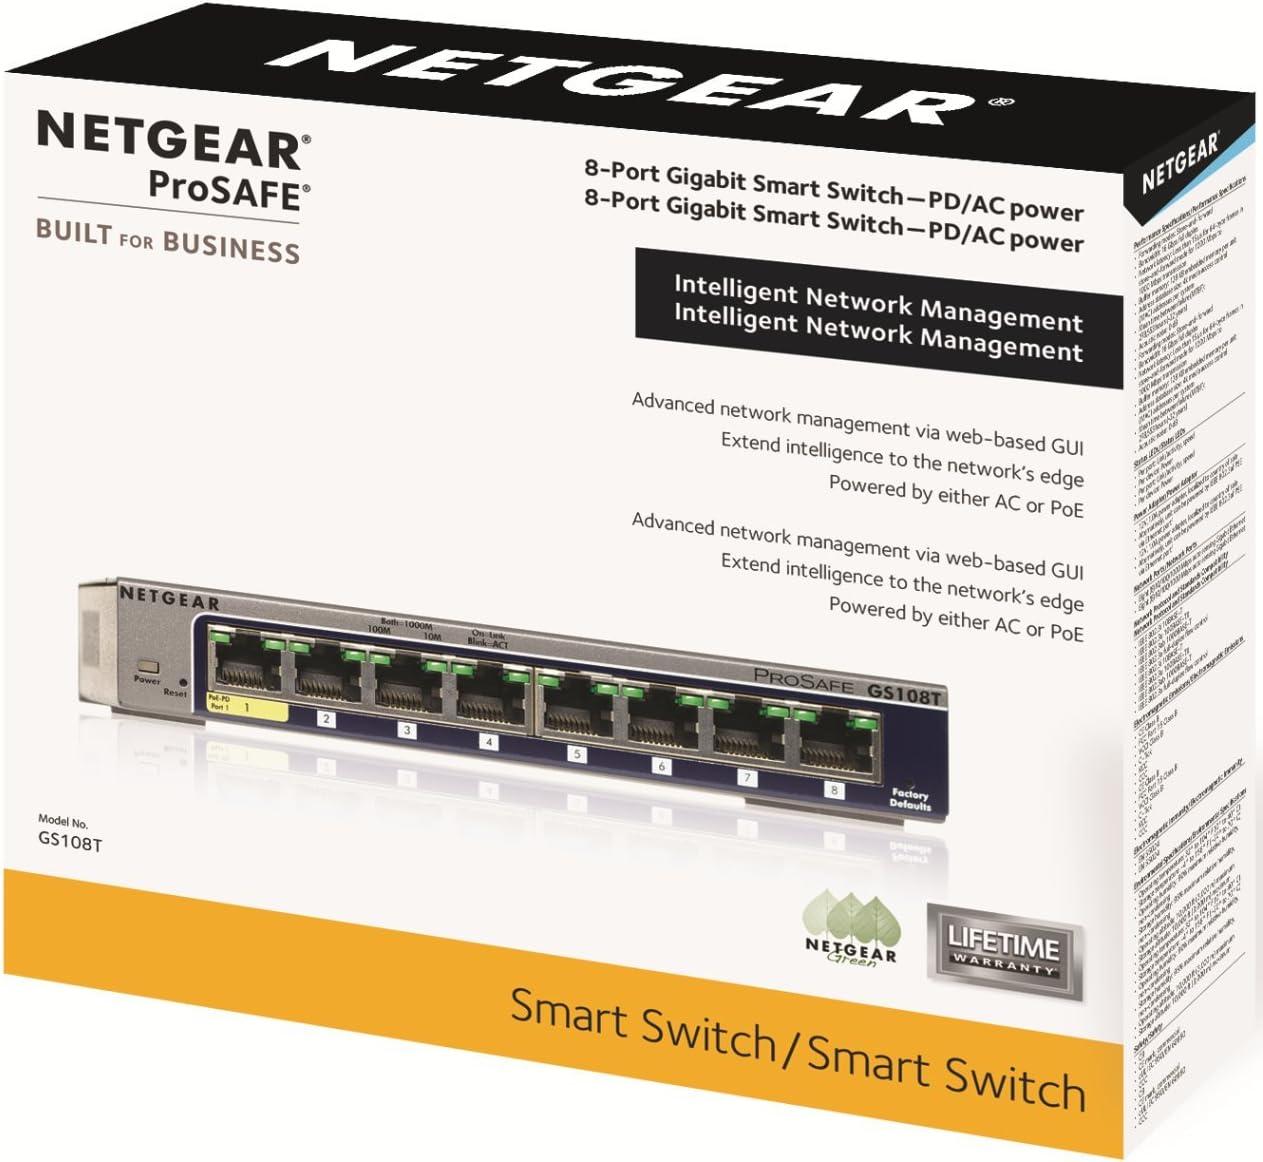 NETGEAR GS108T Prosafe 8-Port Gigabit Smart Switch with 1 port POE